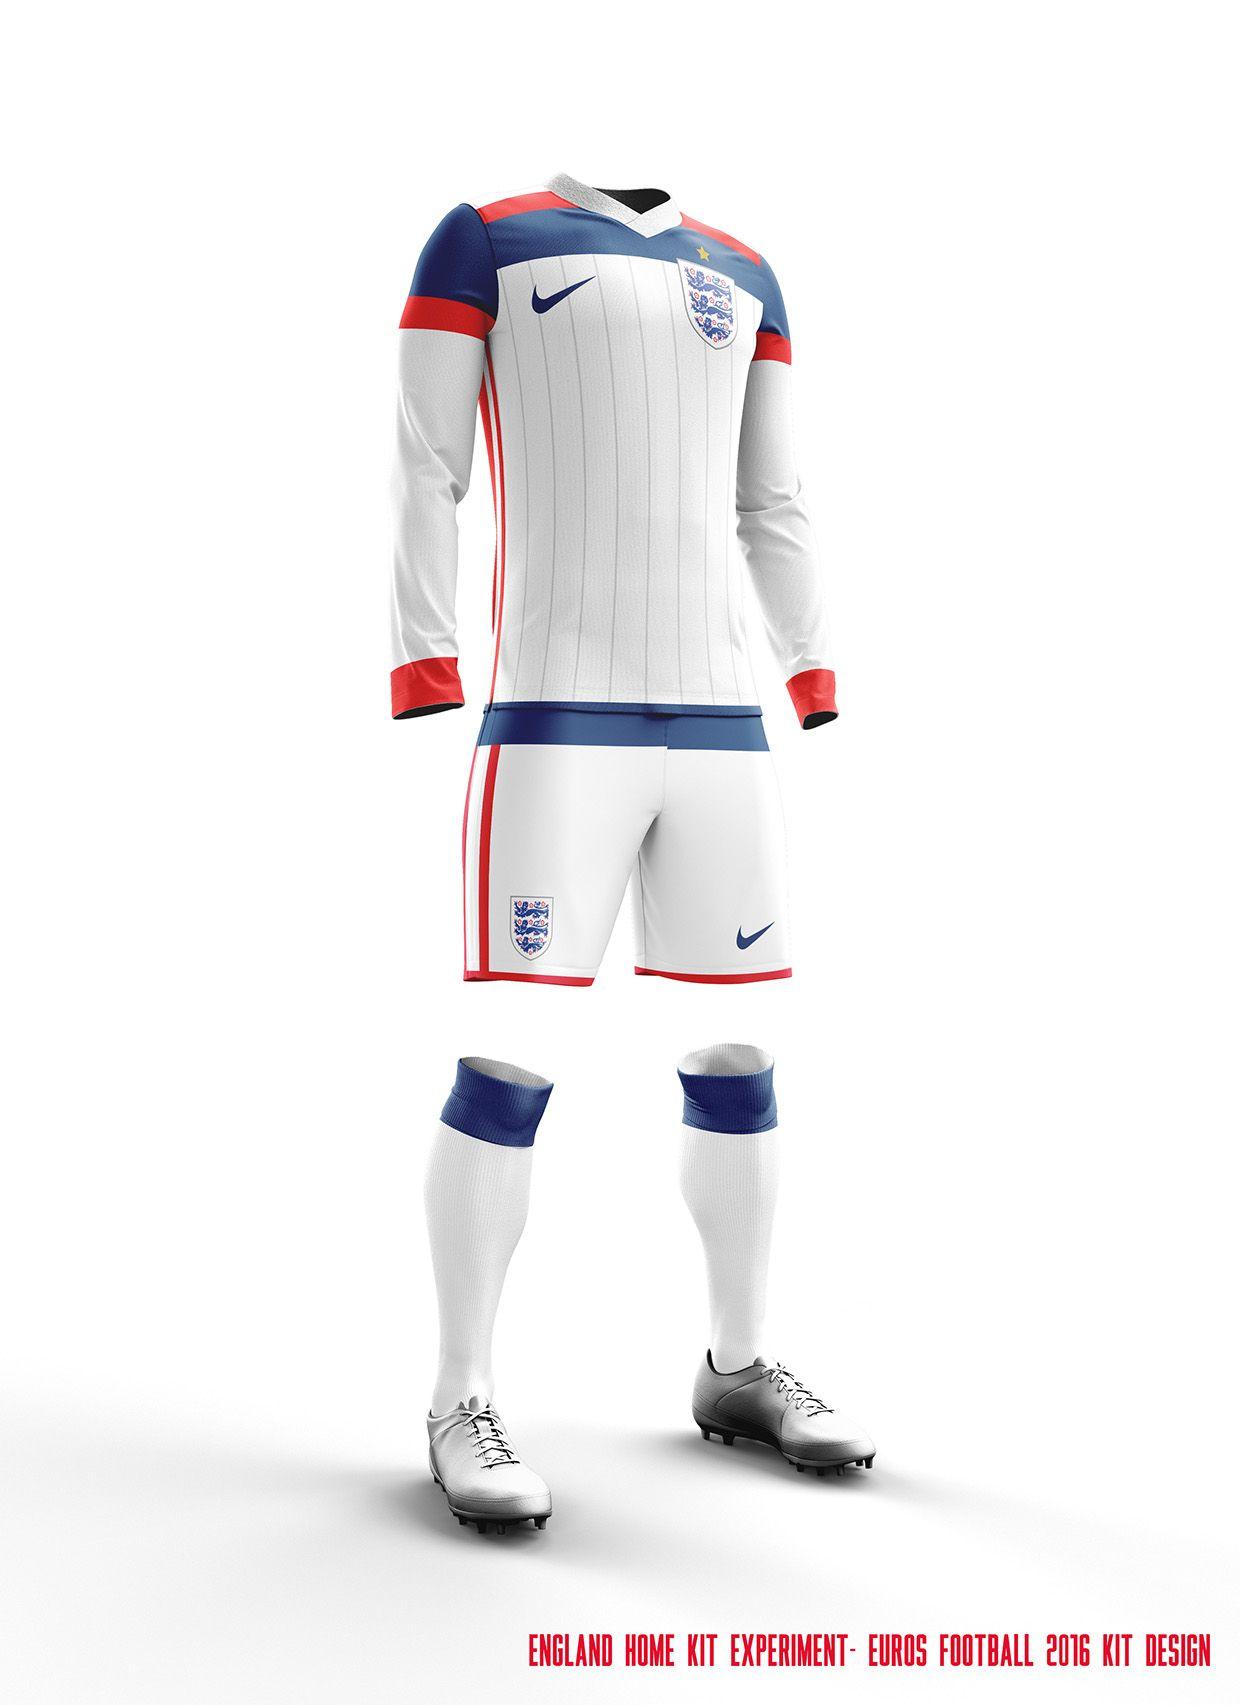 ... Loja Oficial dos Fanáticos ... f09f81a9861 Being a football fan myself  I decided to design some football kit mock ups for  8563f12e7b7 Tenis ... 4e1ea6868fdb0